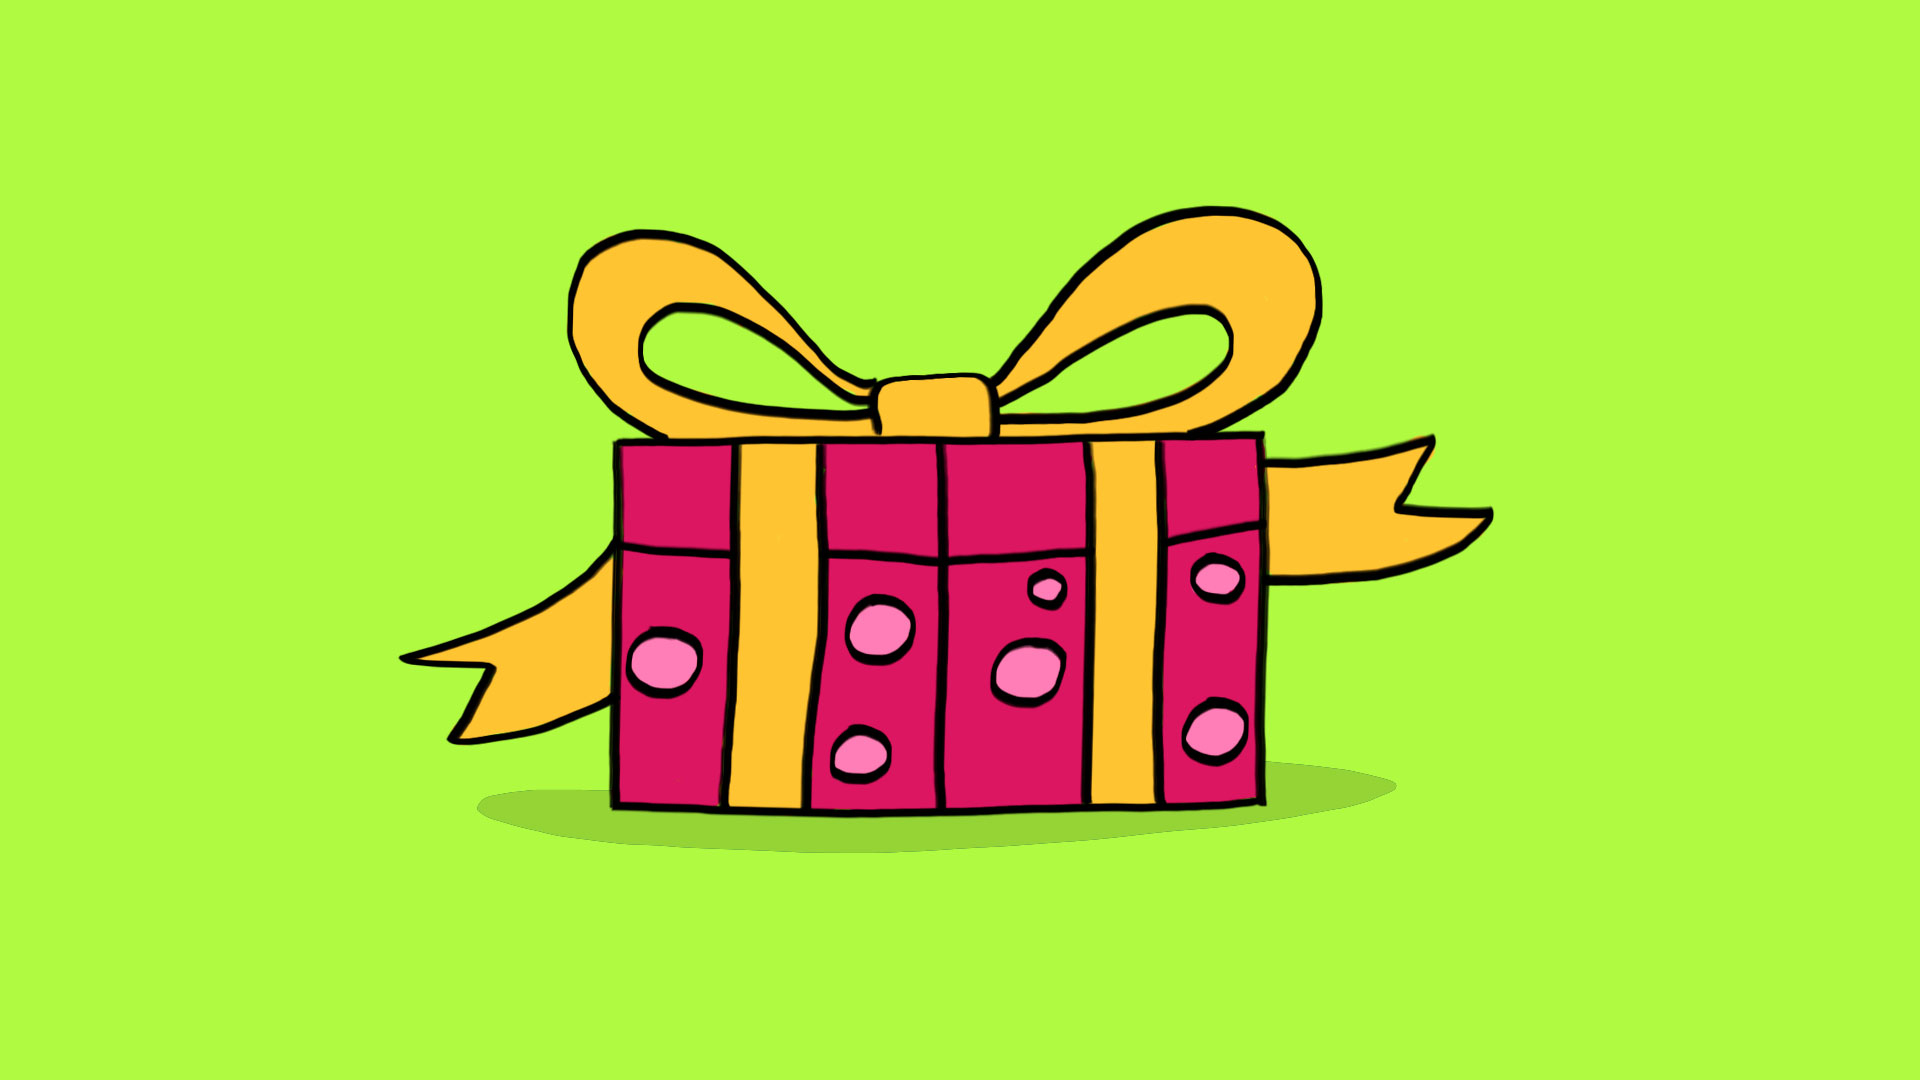 Apprendre À Dessiner Un Cadeau dedans Dessin Cadeau De Noel